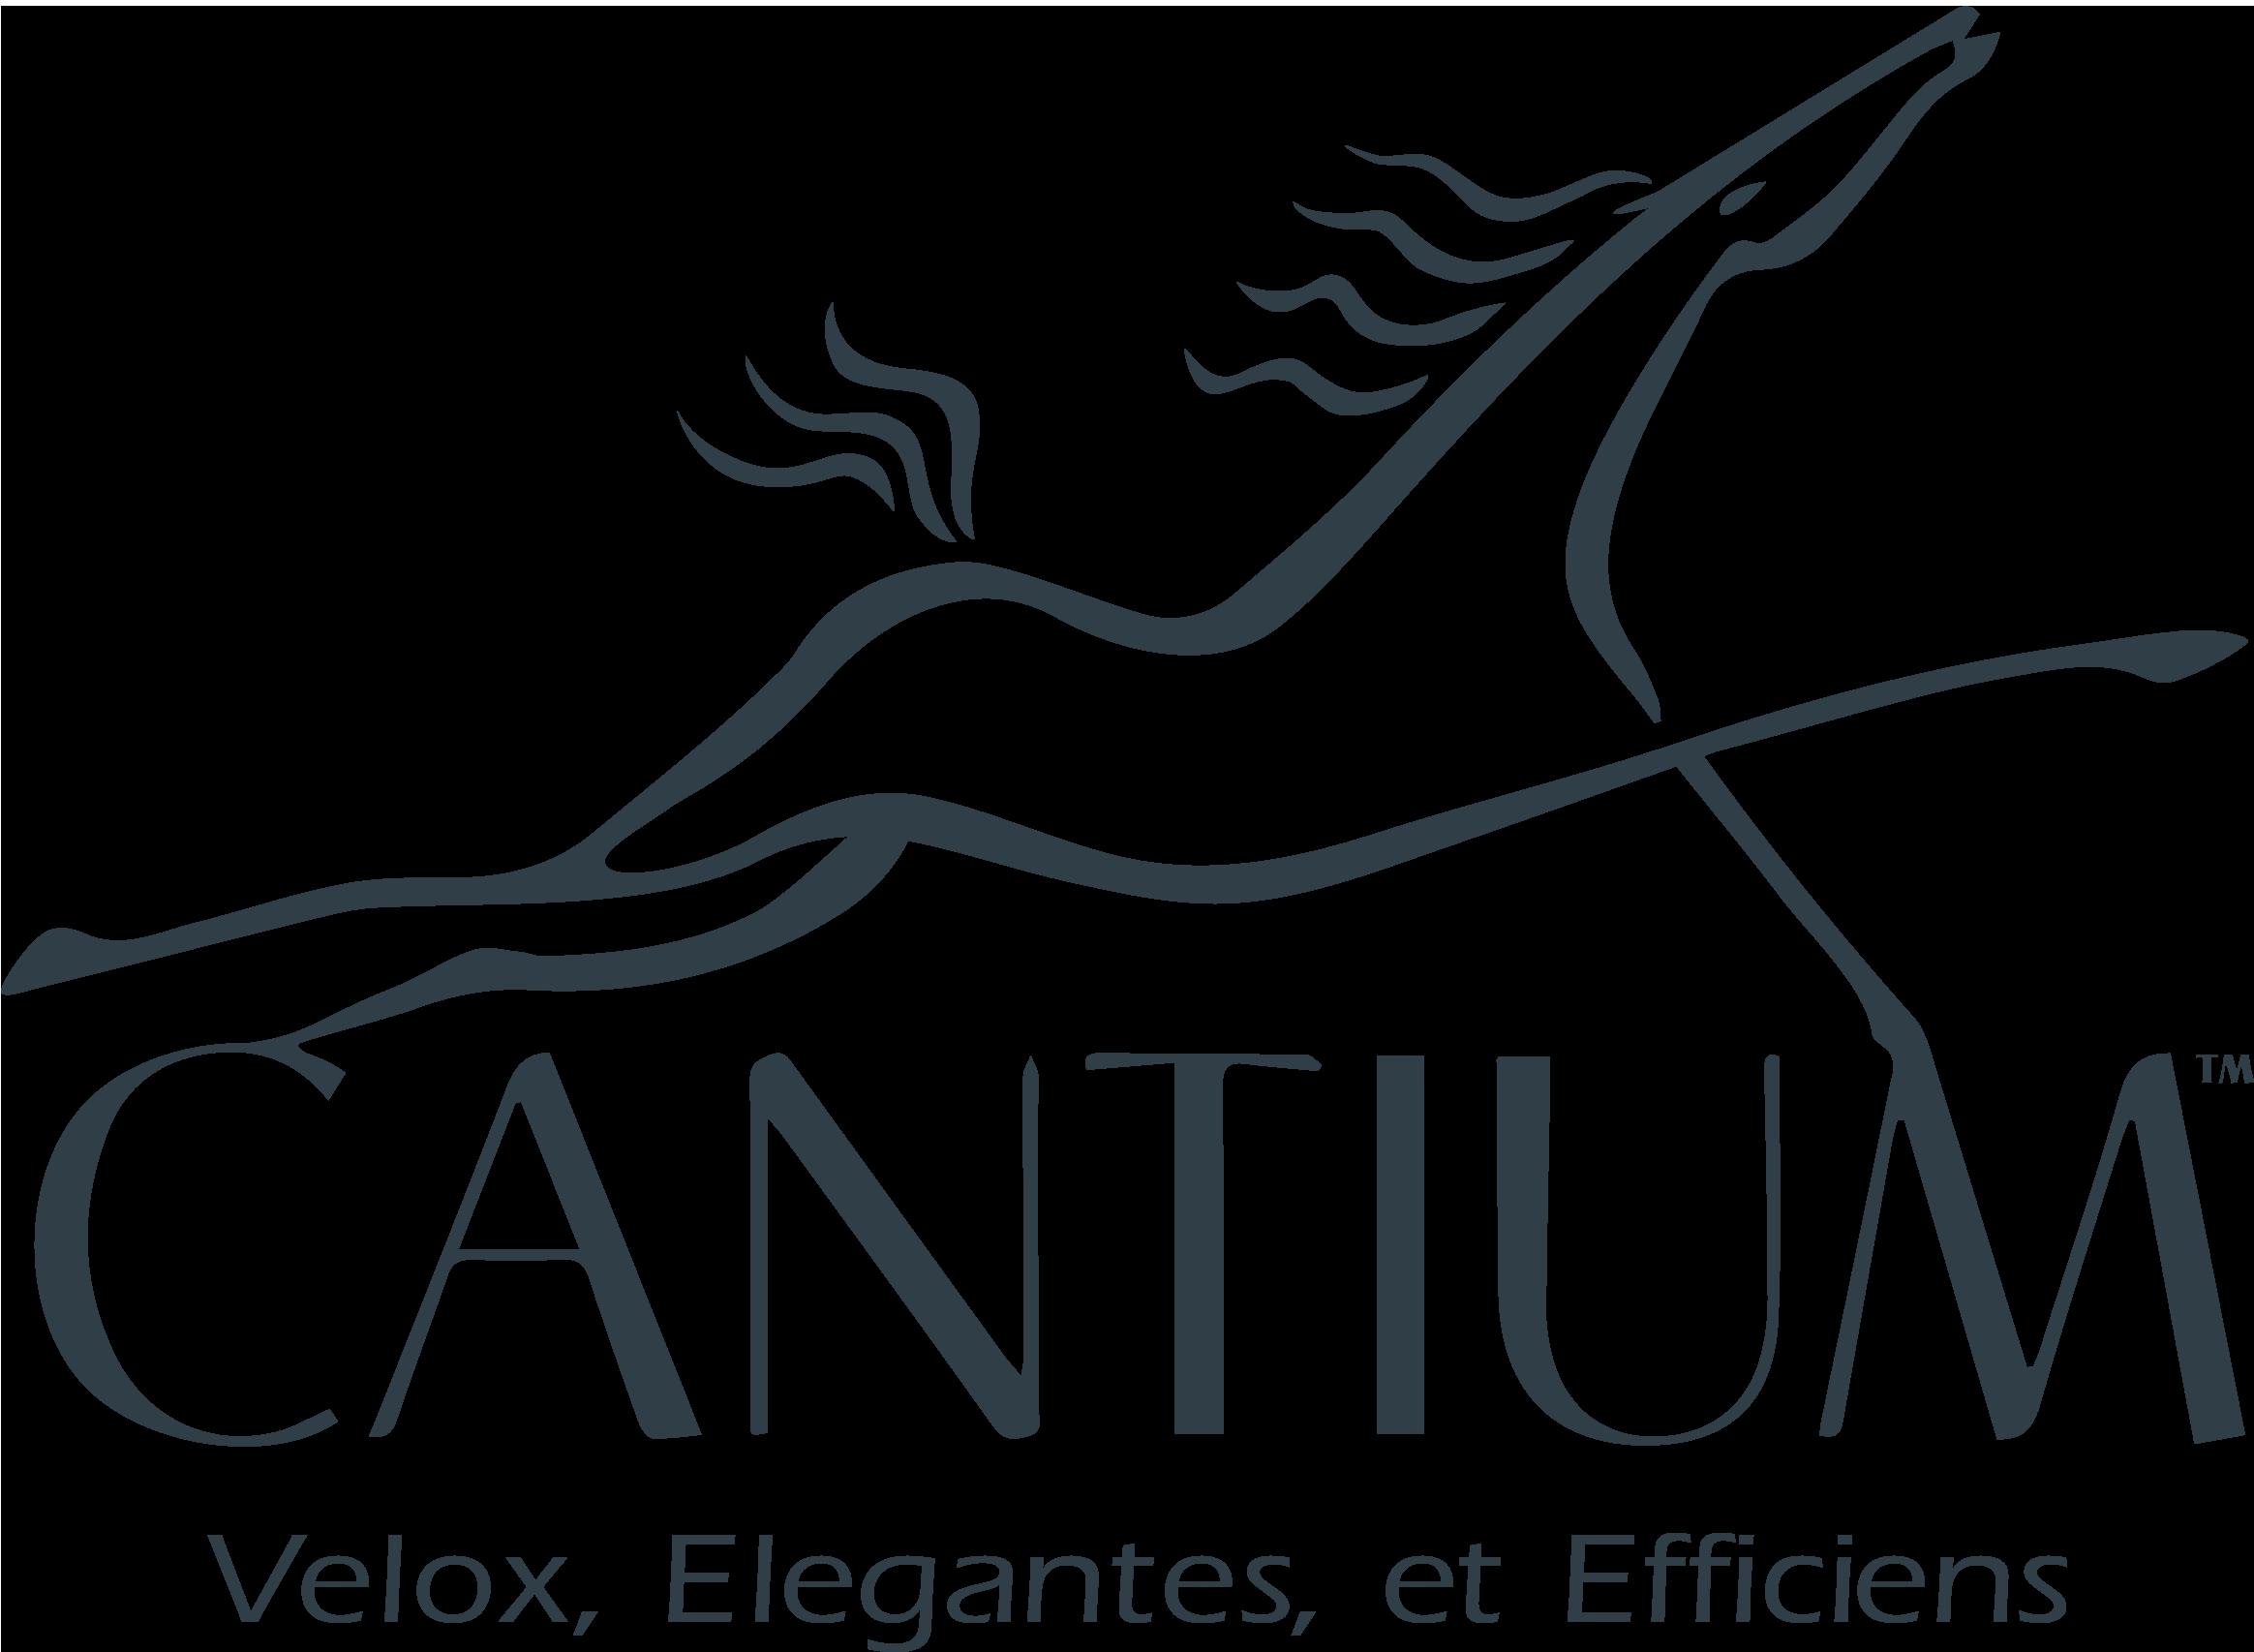 Cantium_Logo_Text_Tagline.png